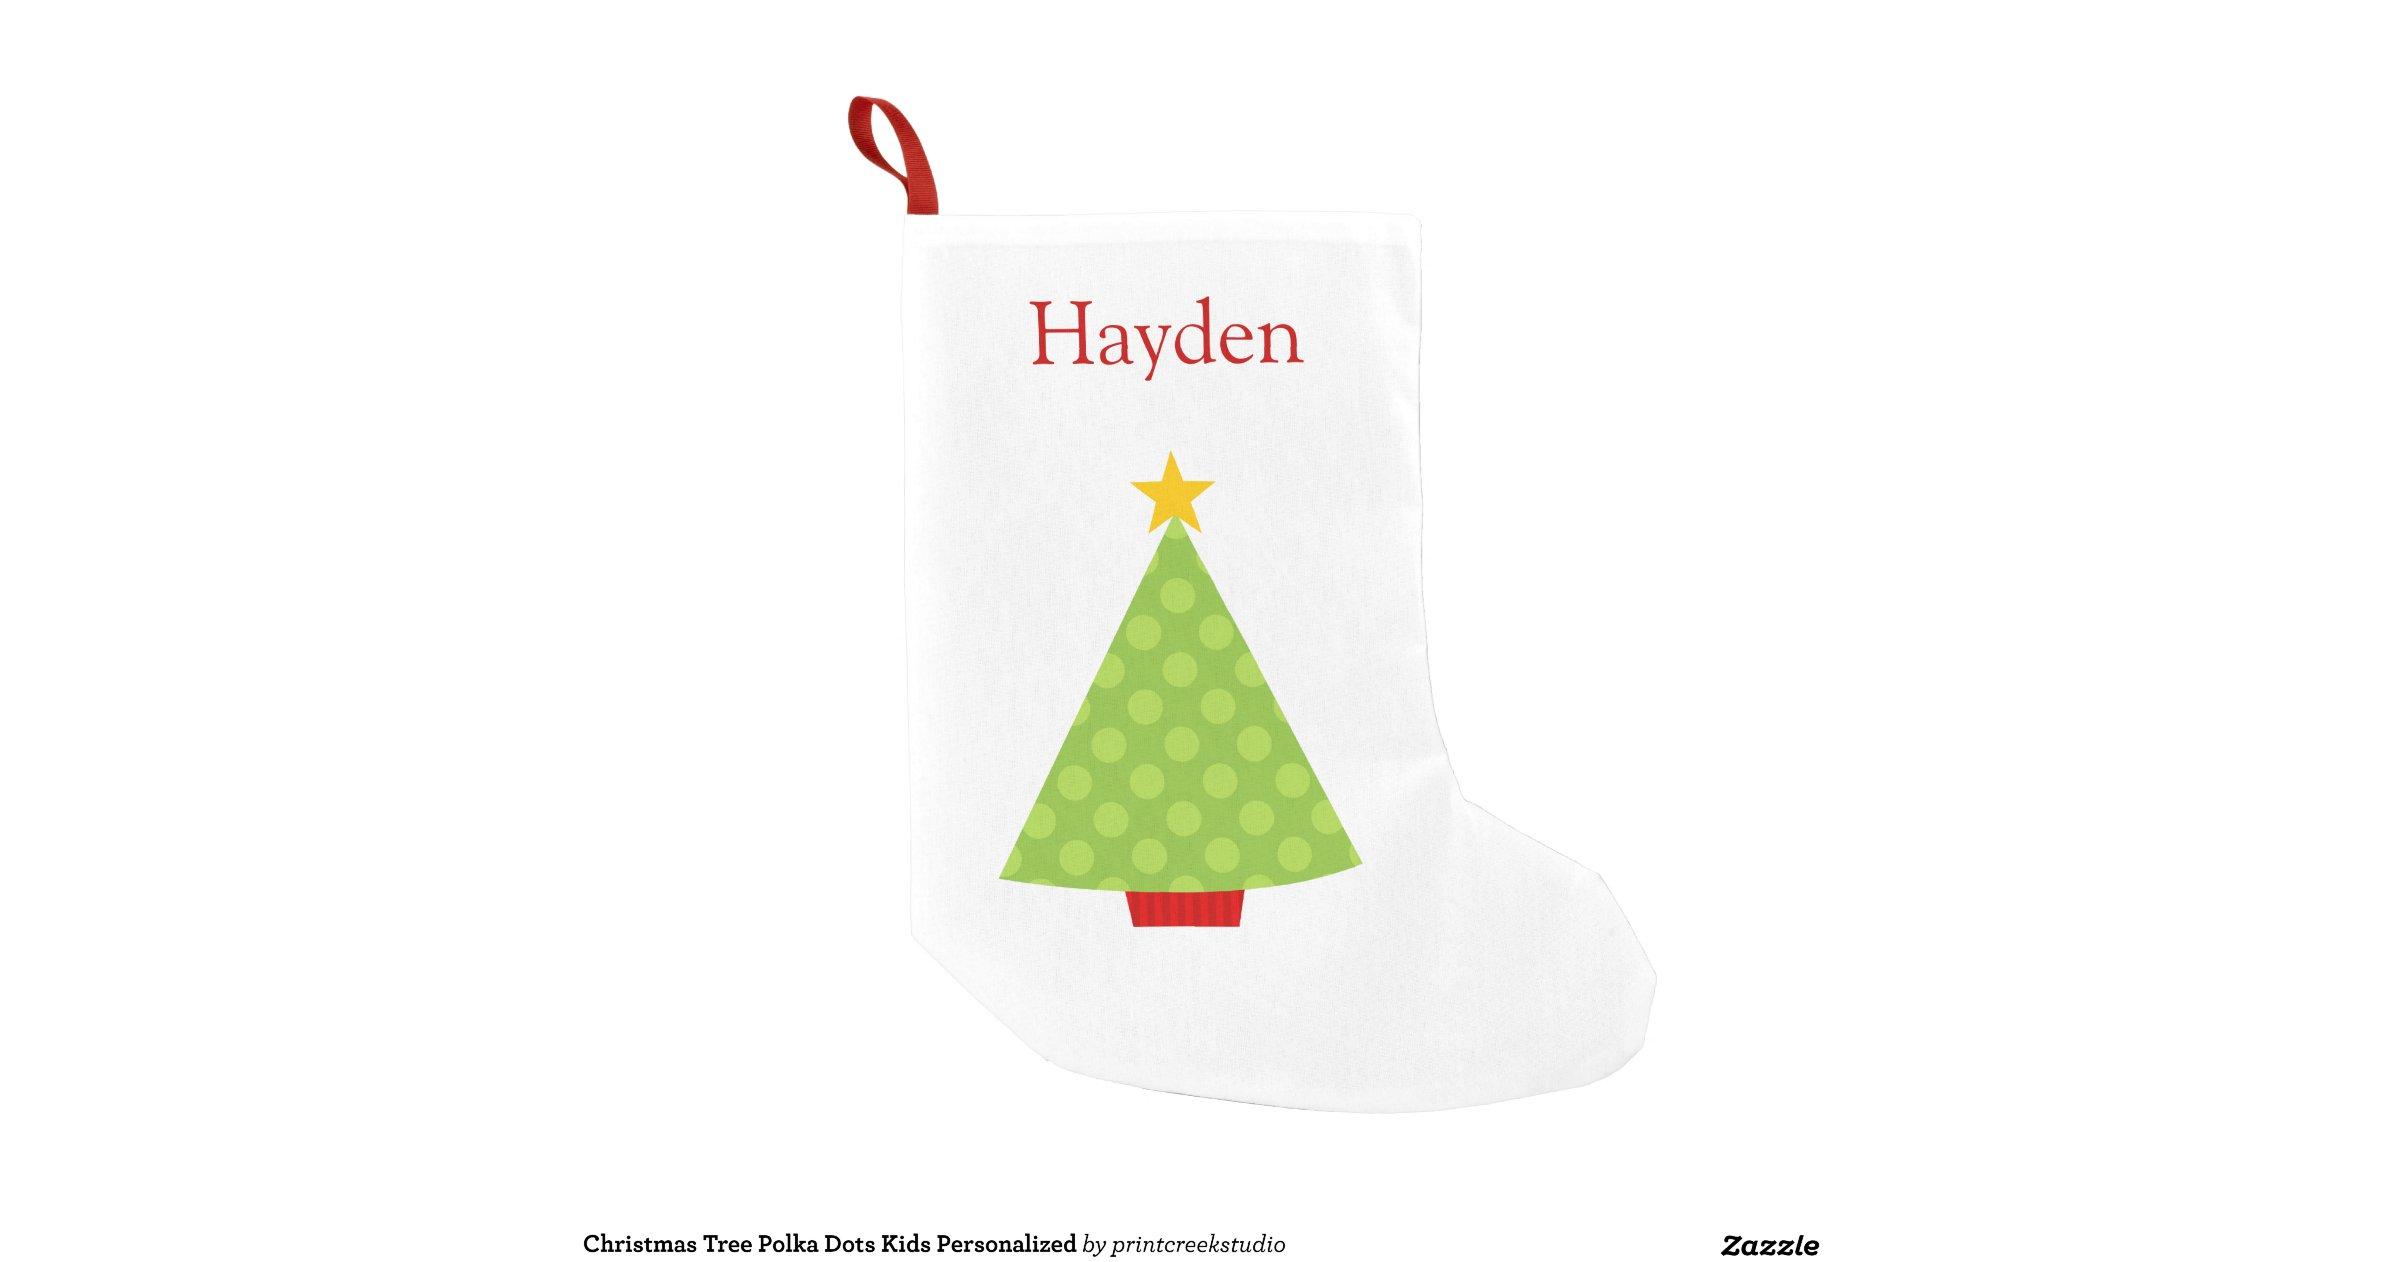 Christmas Tree Polka Dots Kids Personalized Small